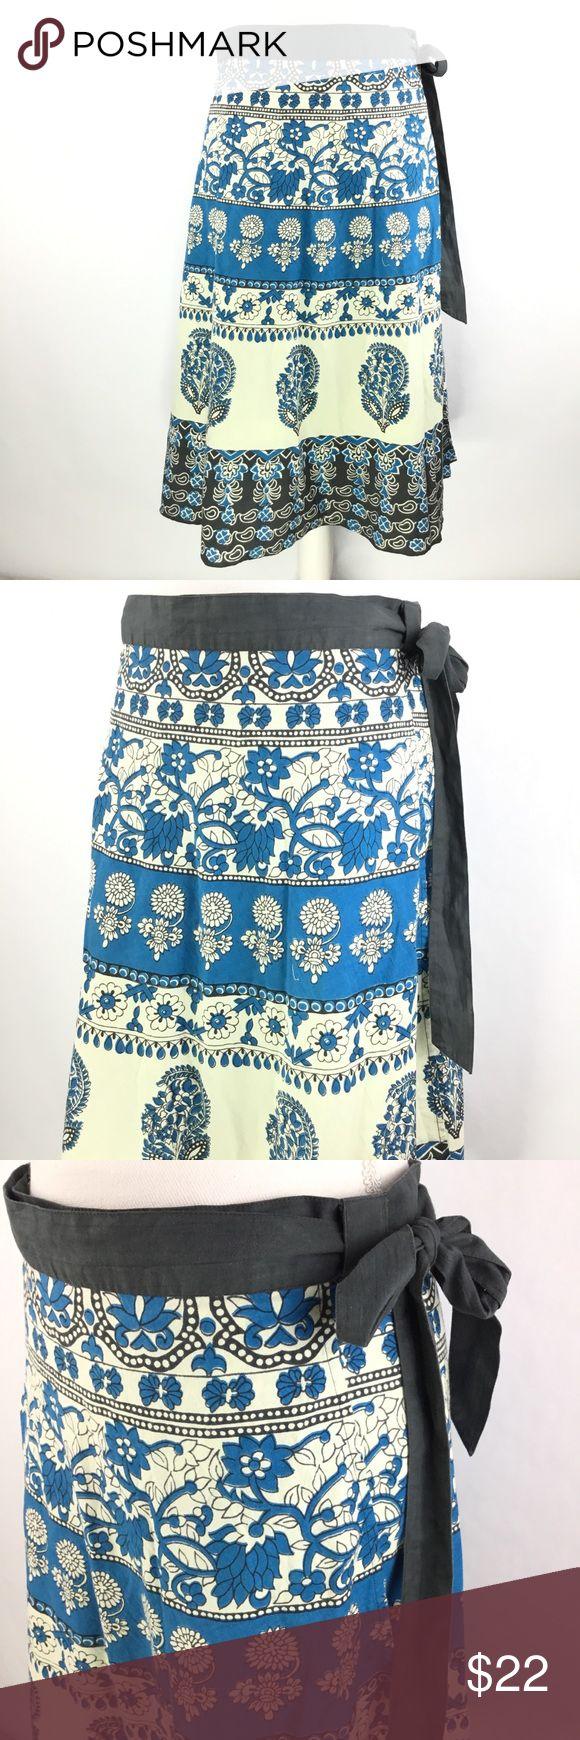 "Lucky Brand Women's Wrap Skirt Sz M Boho Festival LUCKY BRAND Women's Wrap Skirt 100% Cotton  Bohemian blue, beige, gray sarong  Size medium  Very good Condition   Length from waist to hem: 27"" Lucky Brand Skirts"